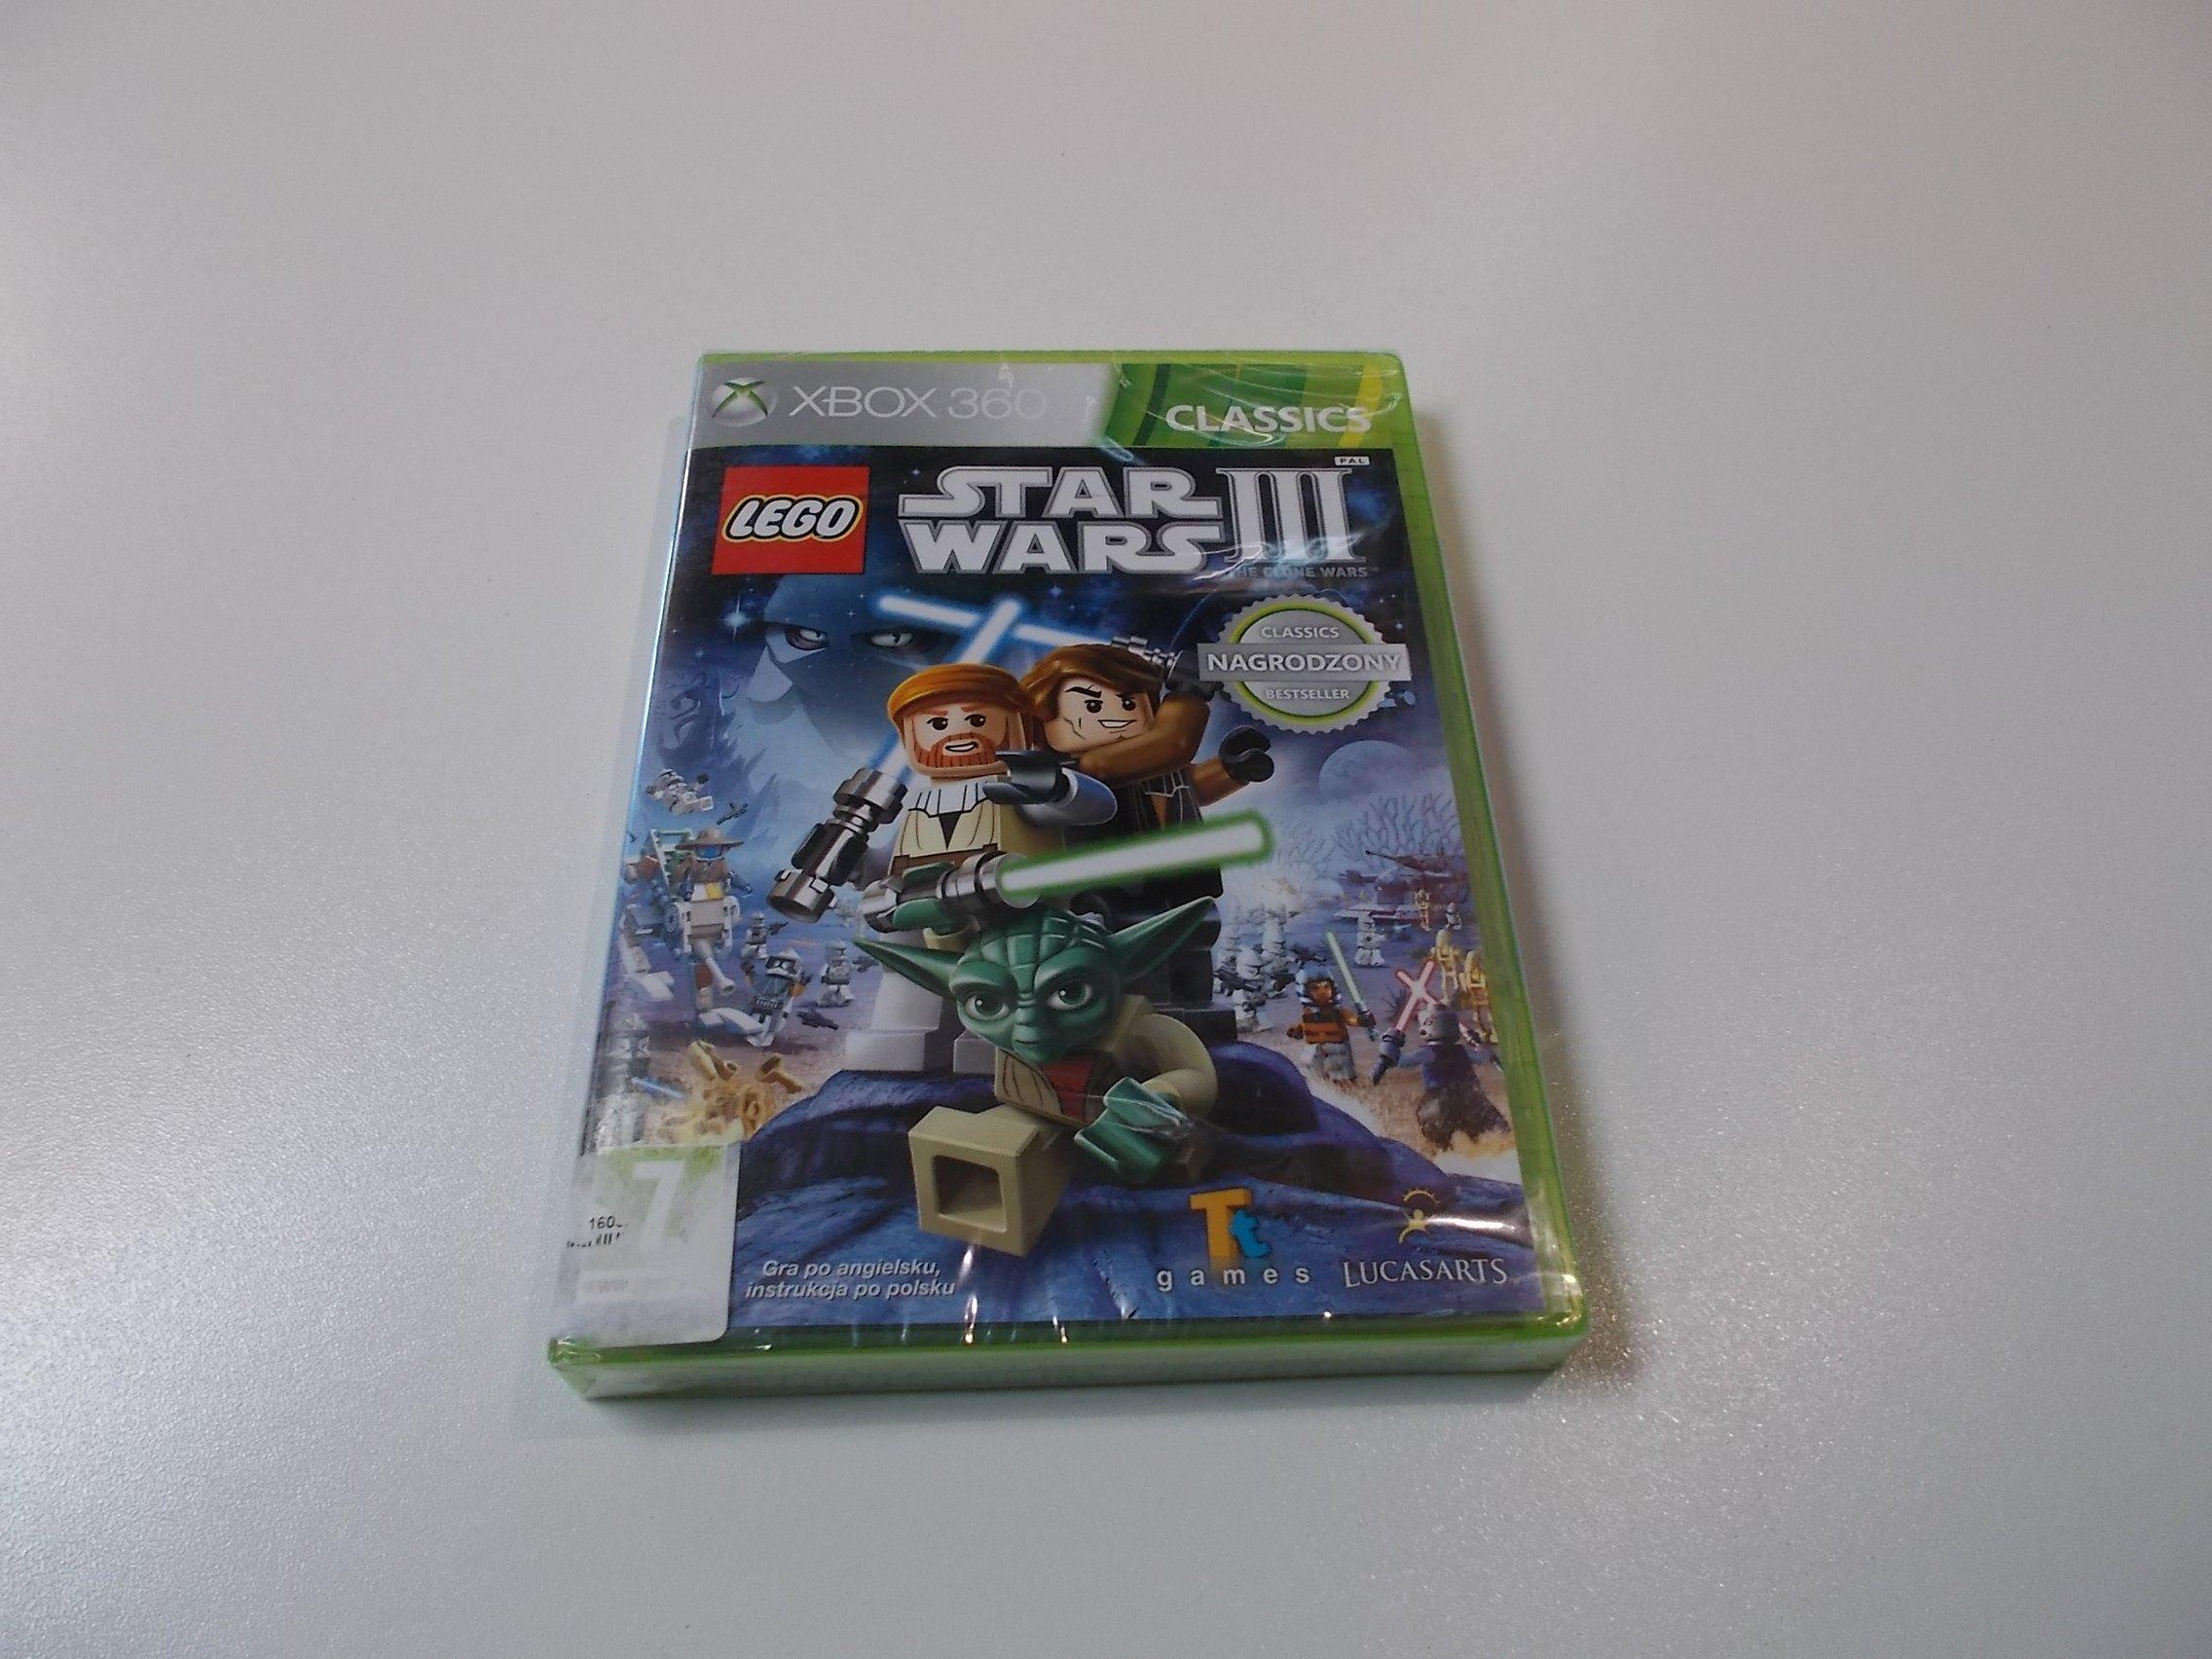 LEGO Star Wars III 3 - GRA Xbox 360 - Opole 0417